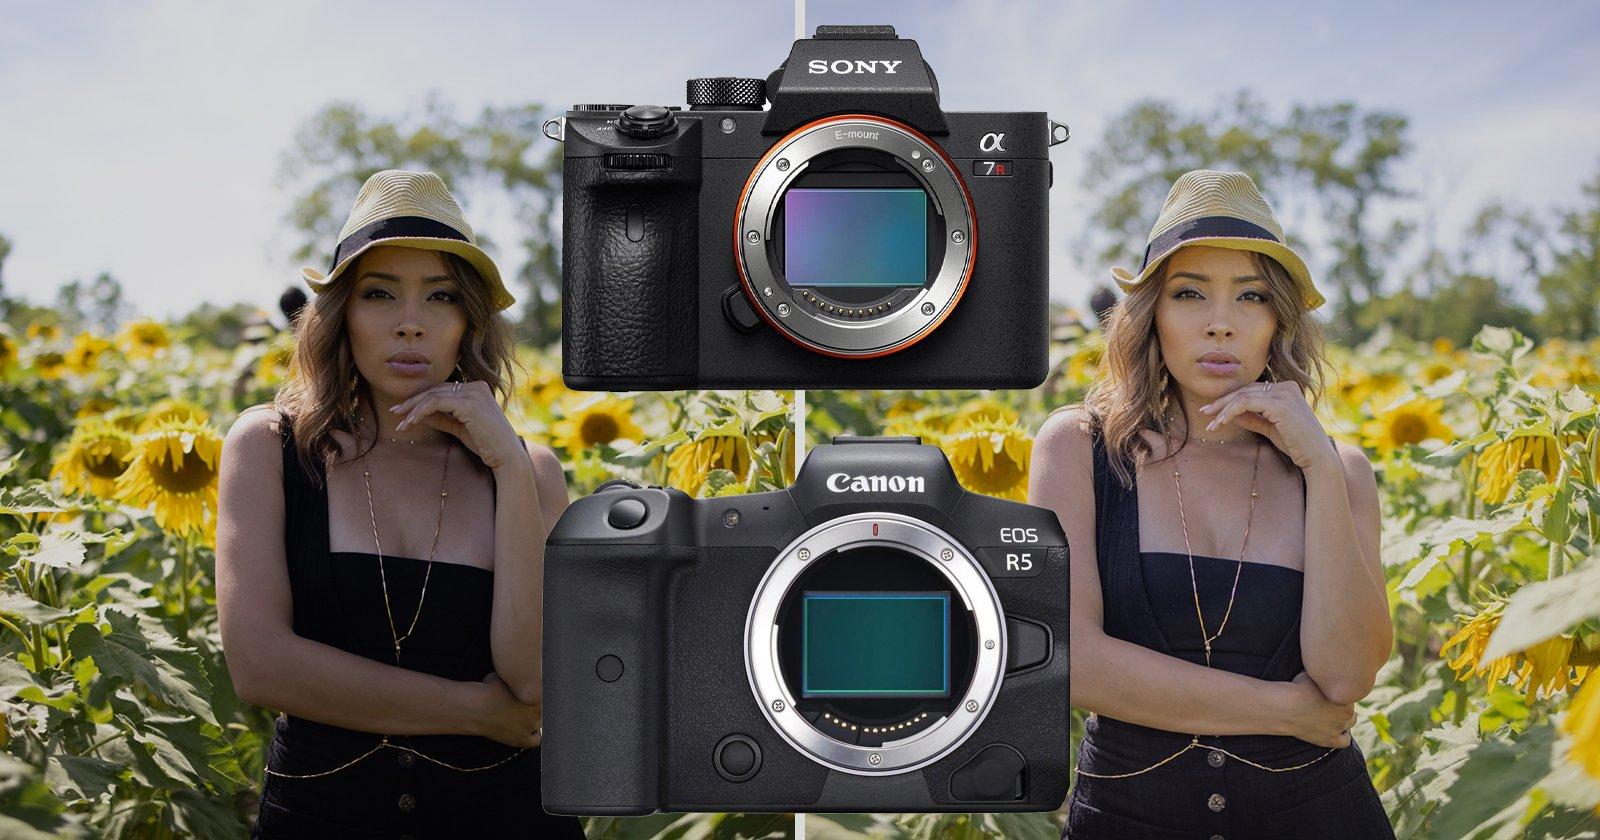 Canon EOS R5 vs Sony a7R III Dynamic Range Test: Has Canon Caught Up?